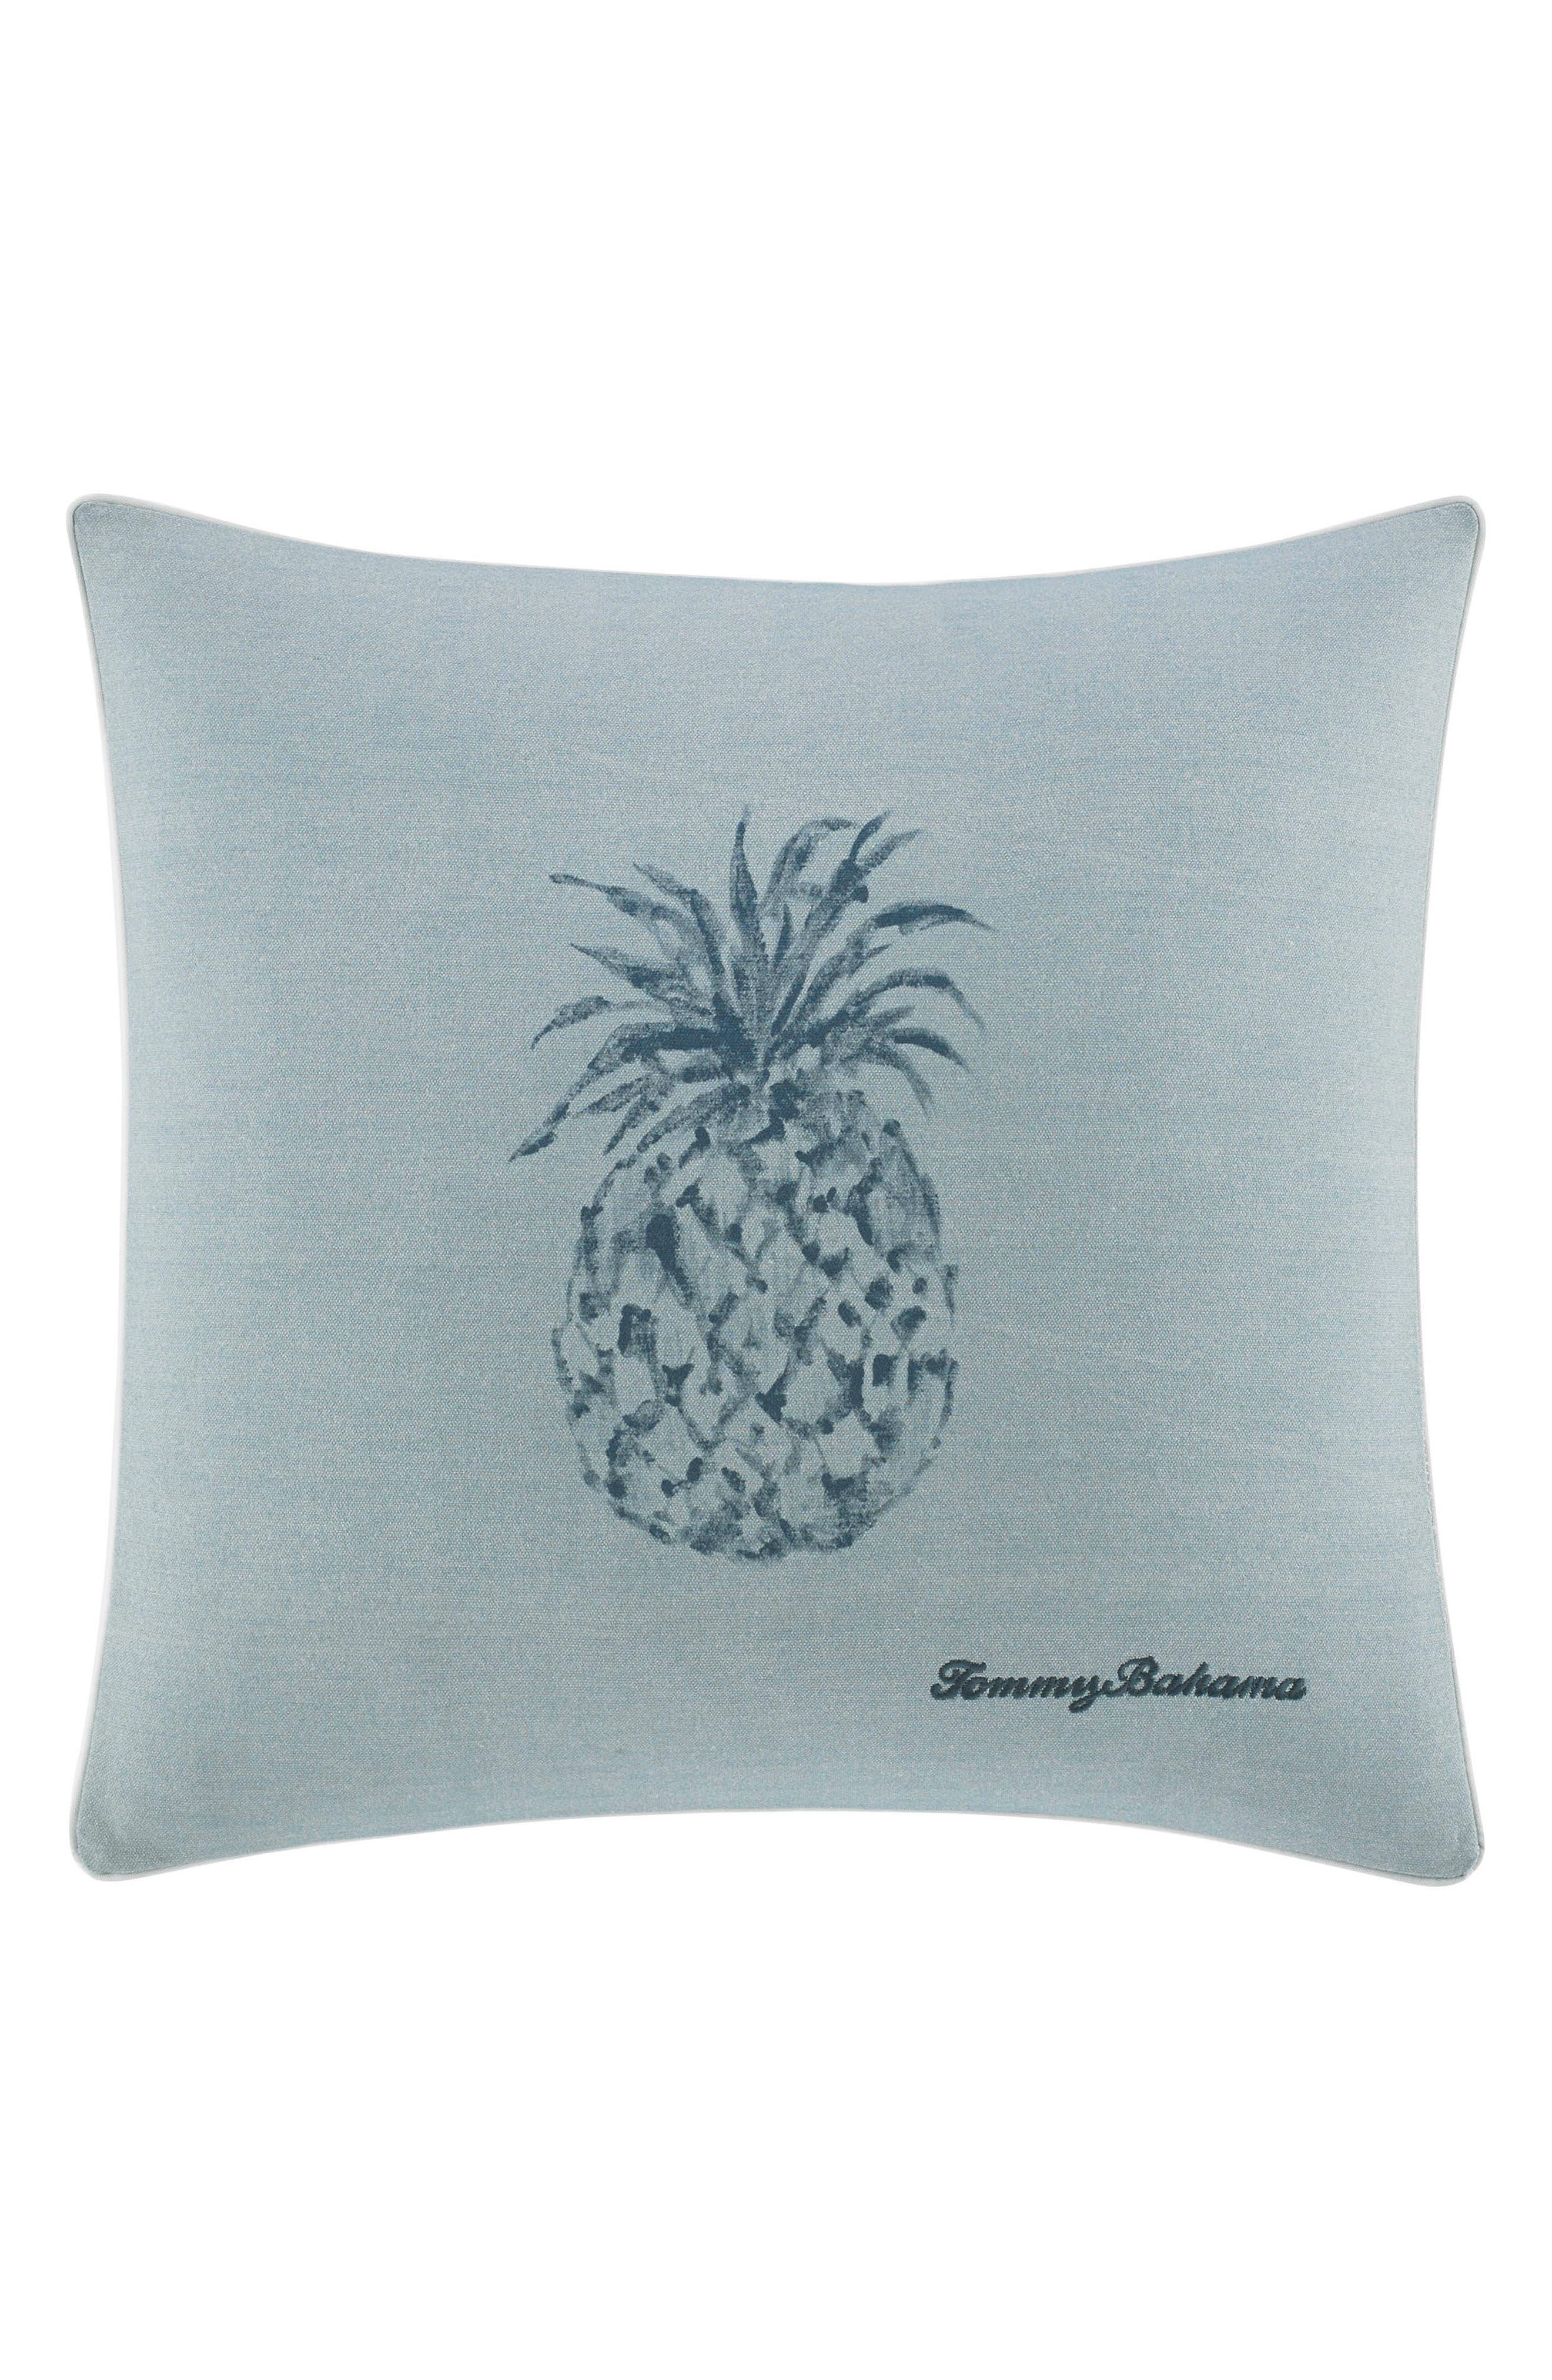 Raw Coast Pineapple Pillow,                         Main,                         color, BLUE